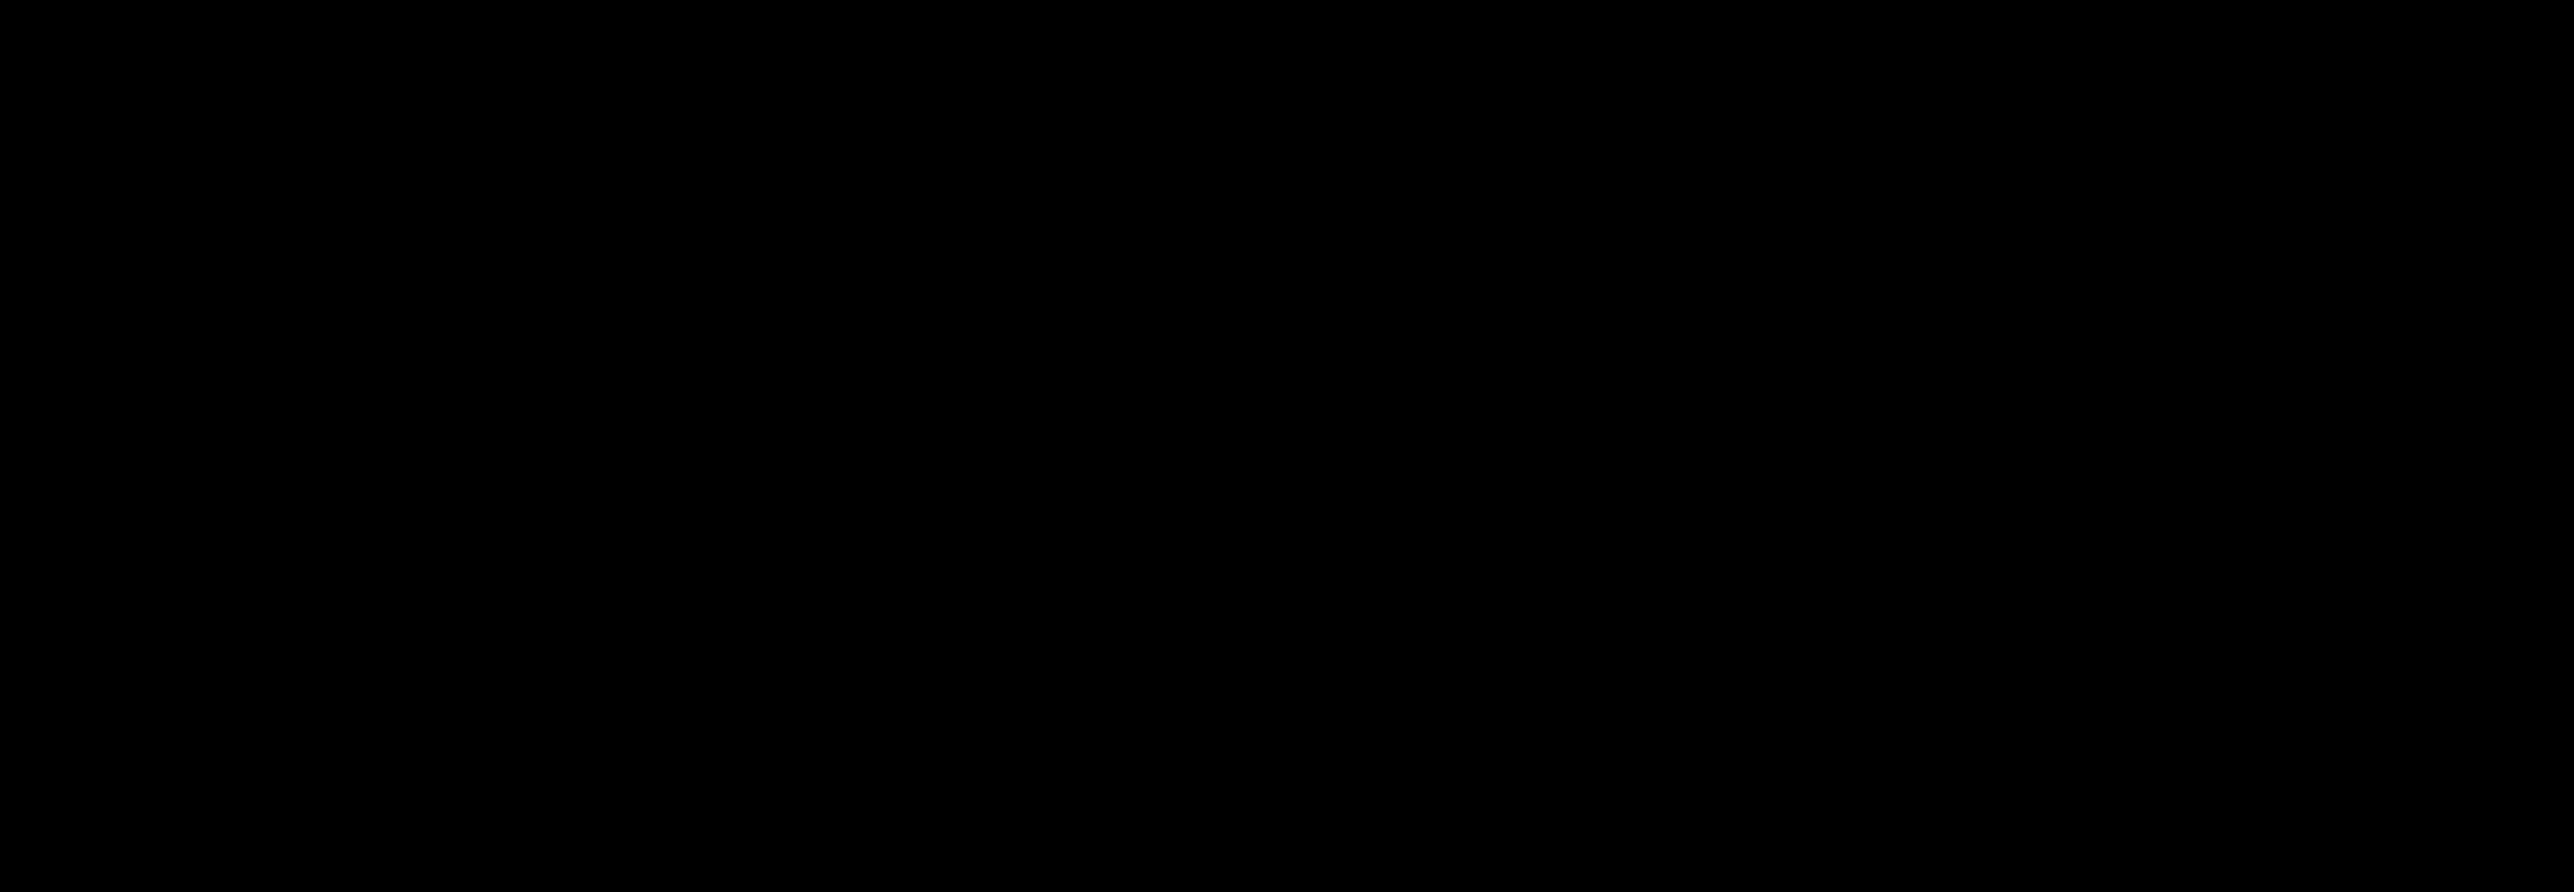 Aplysamine-4 hydrogenbromide